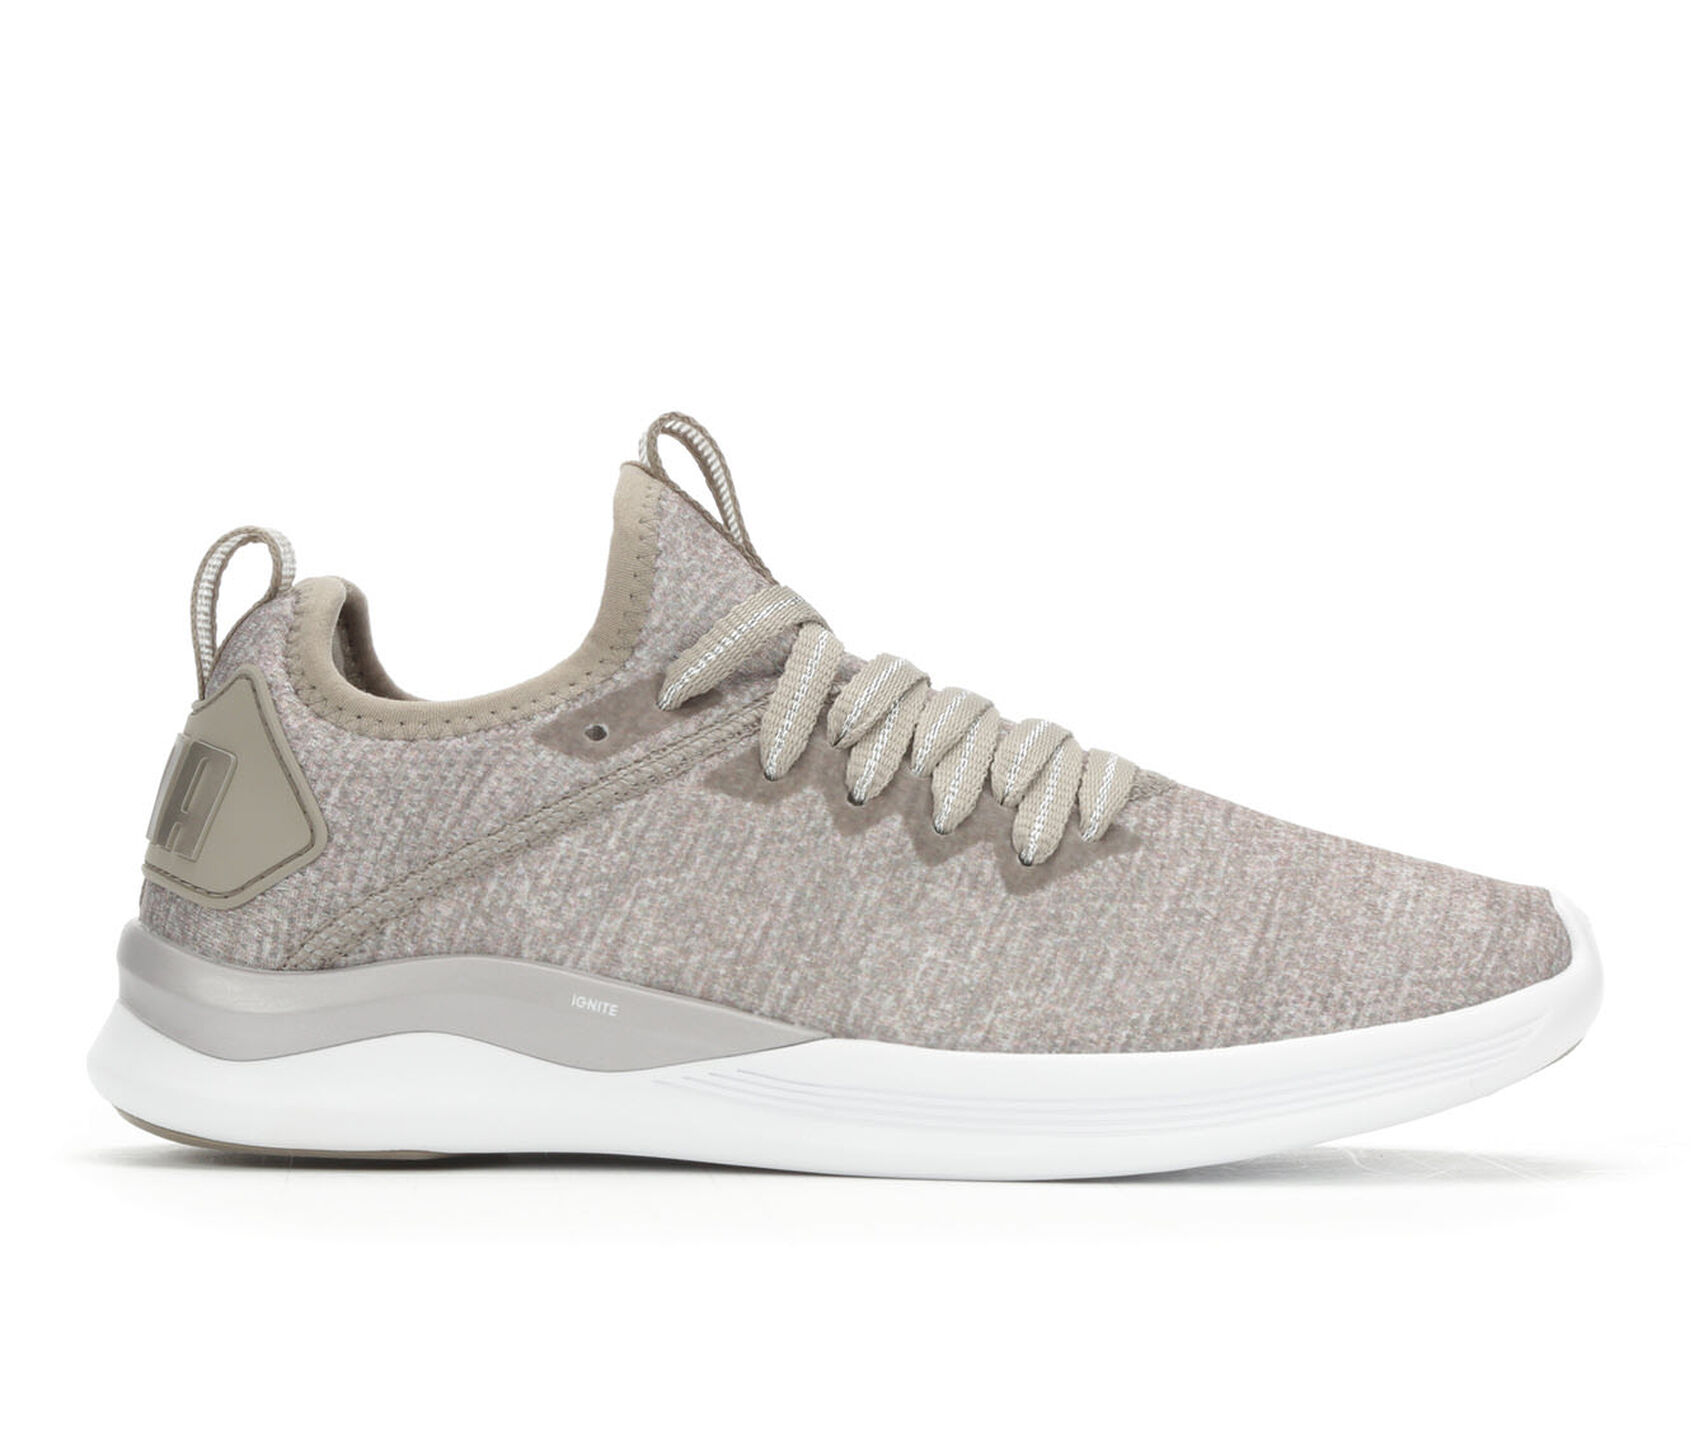 7a11bd663d3883 Women s Puma Ignite Flash Evoknit EP Sneakers